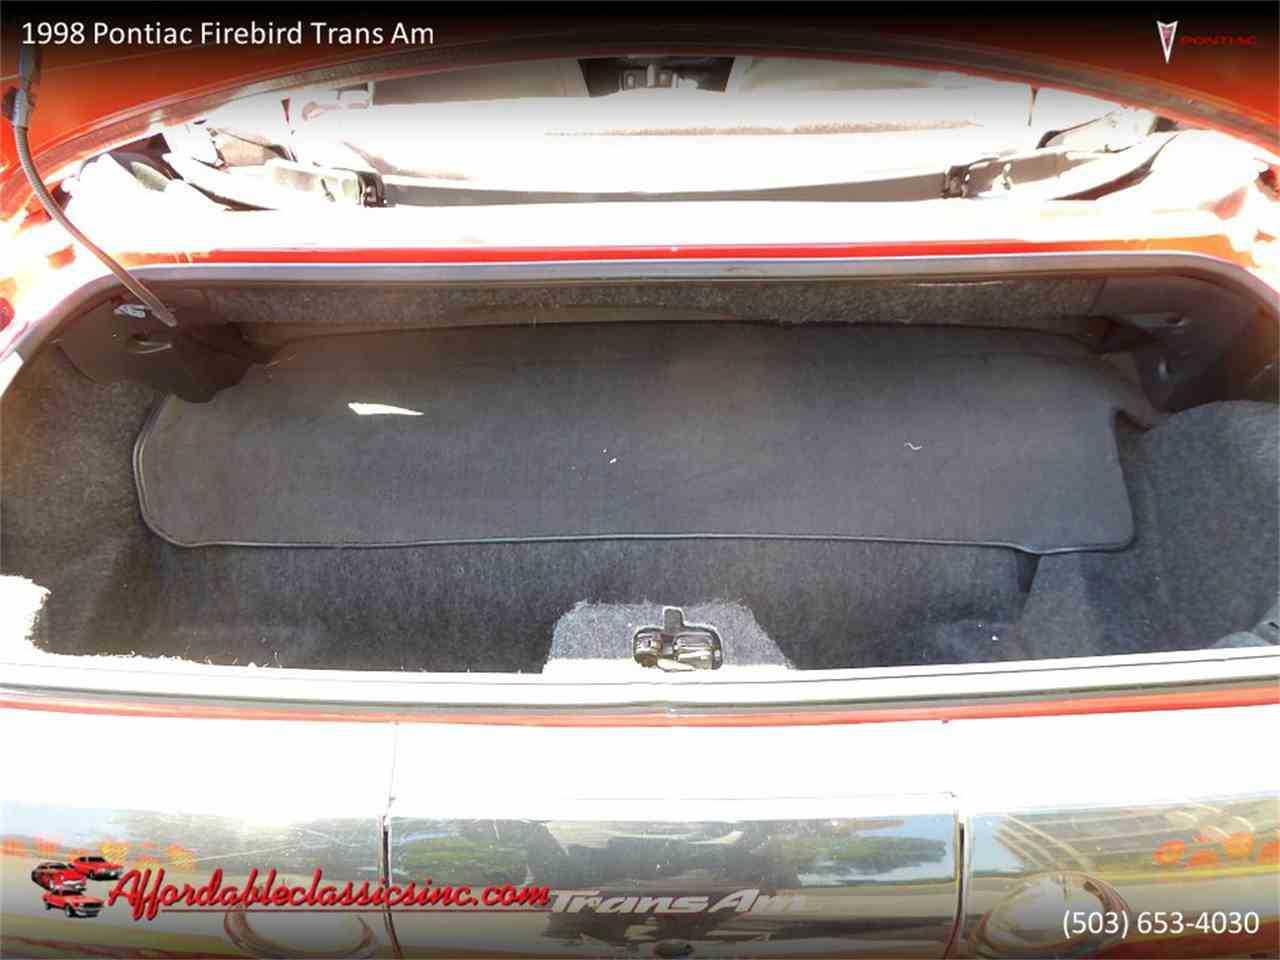 1998 Pontiac Firebird Trans Am For Sale In Gladstone Or Specs 2g2fv32g7w2219766